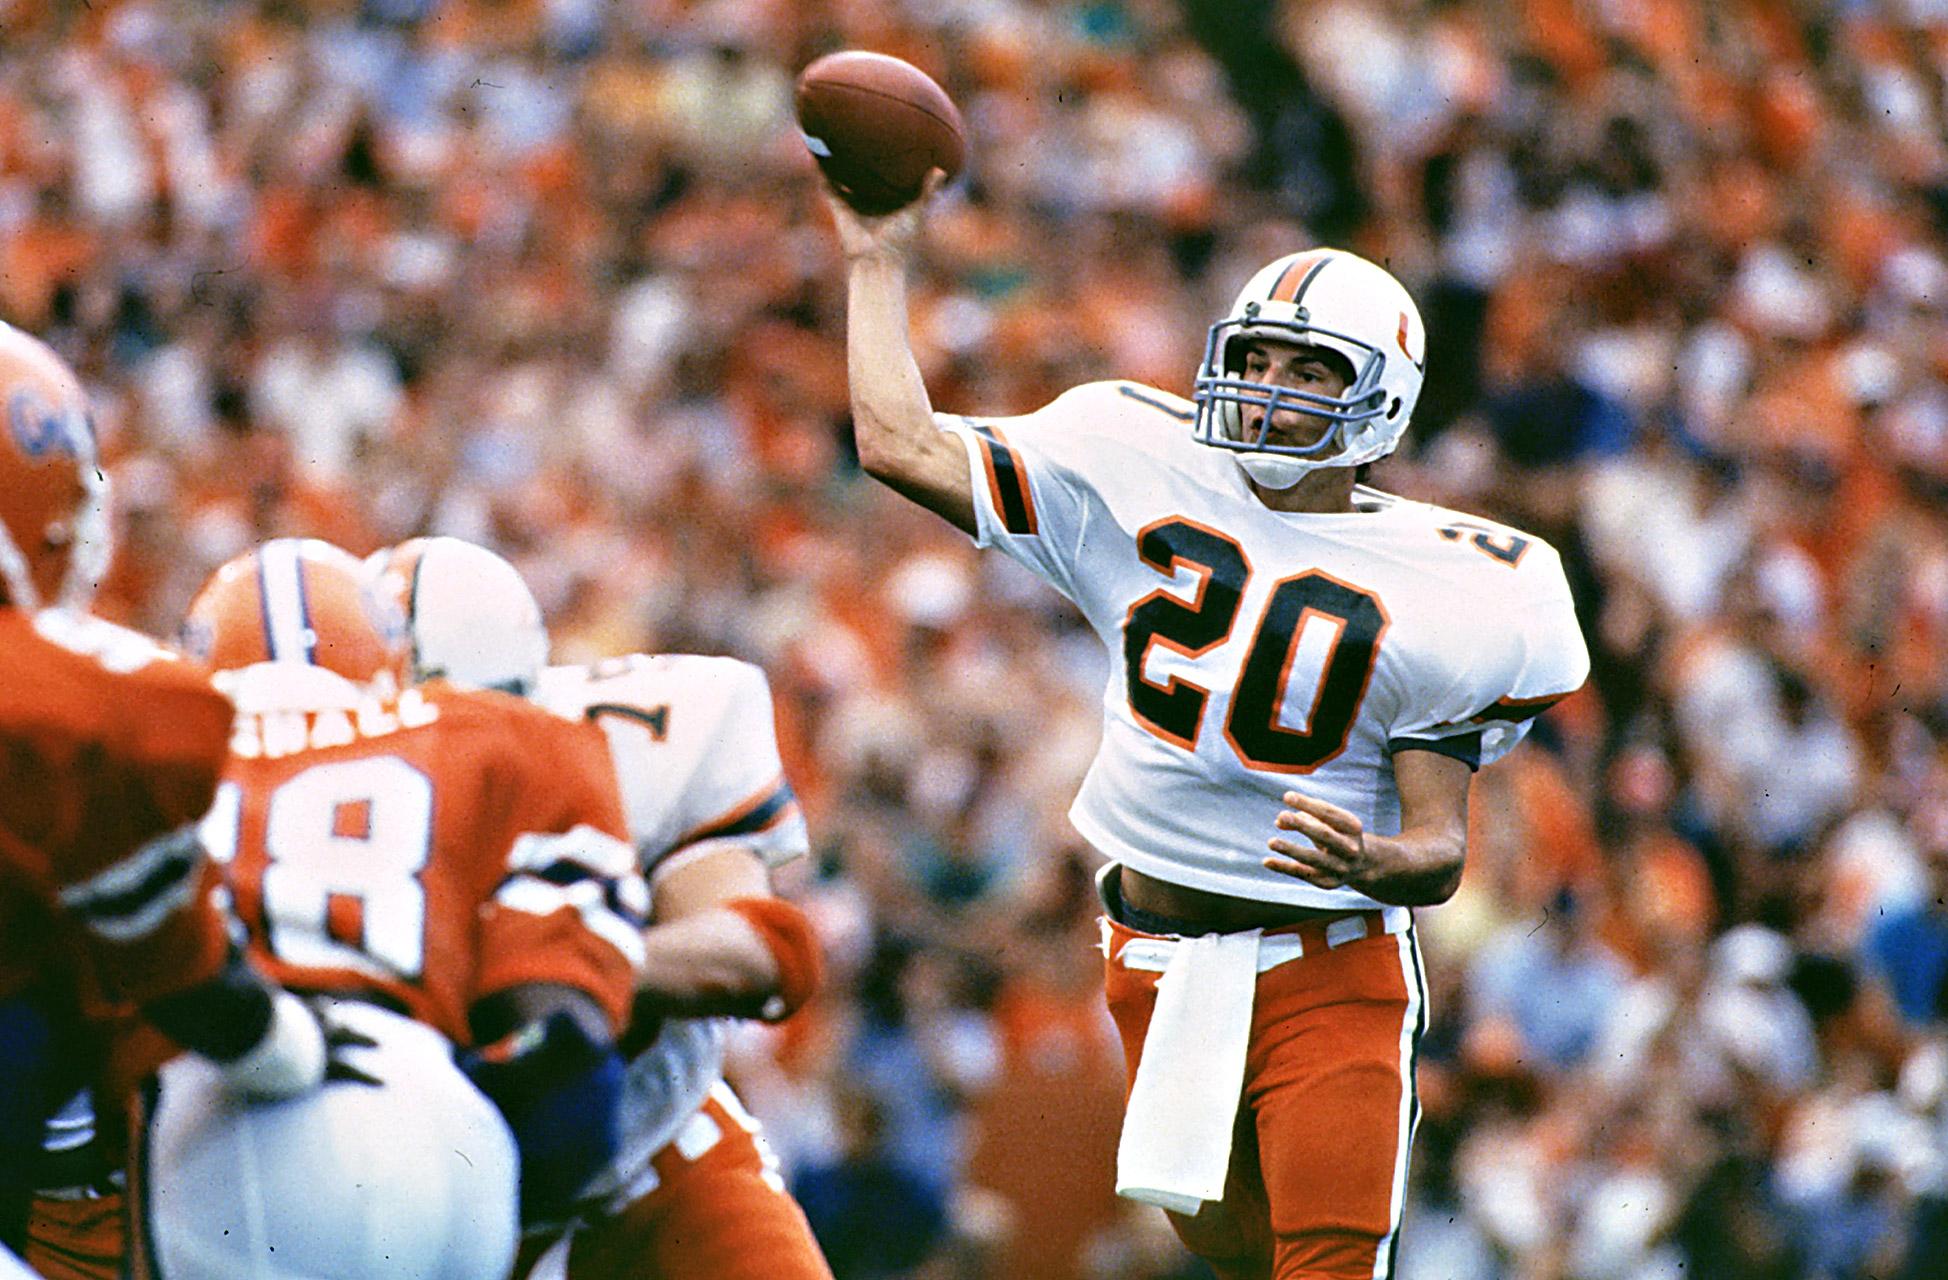 Gainesville, Fla.: Sept. 3, 1983